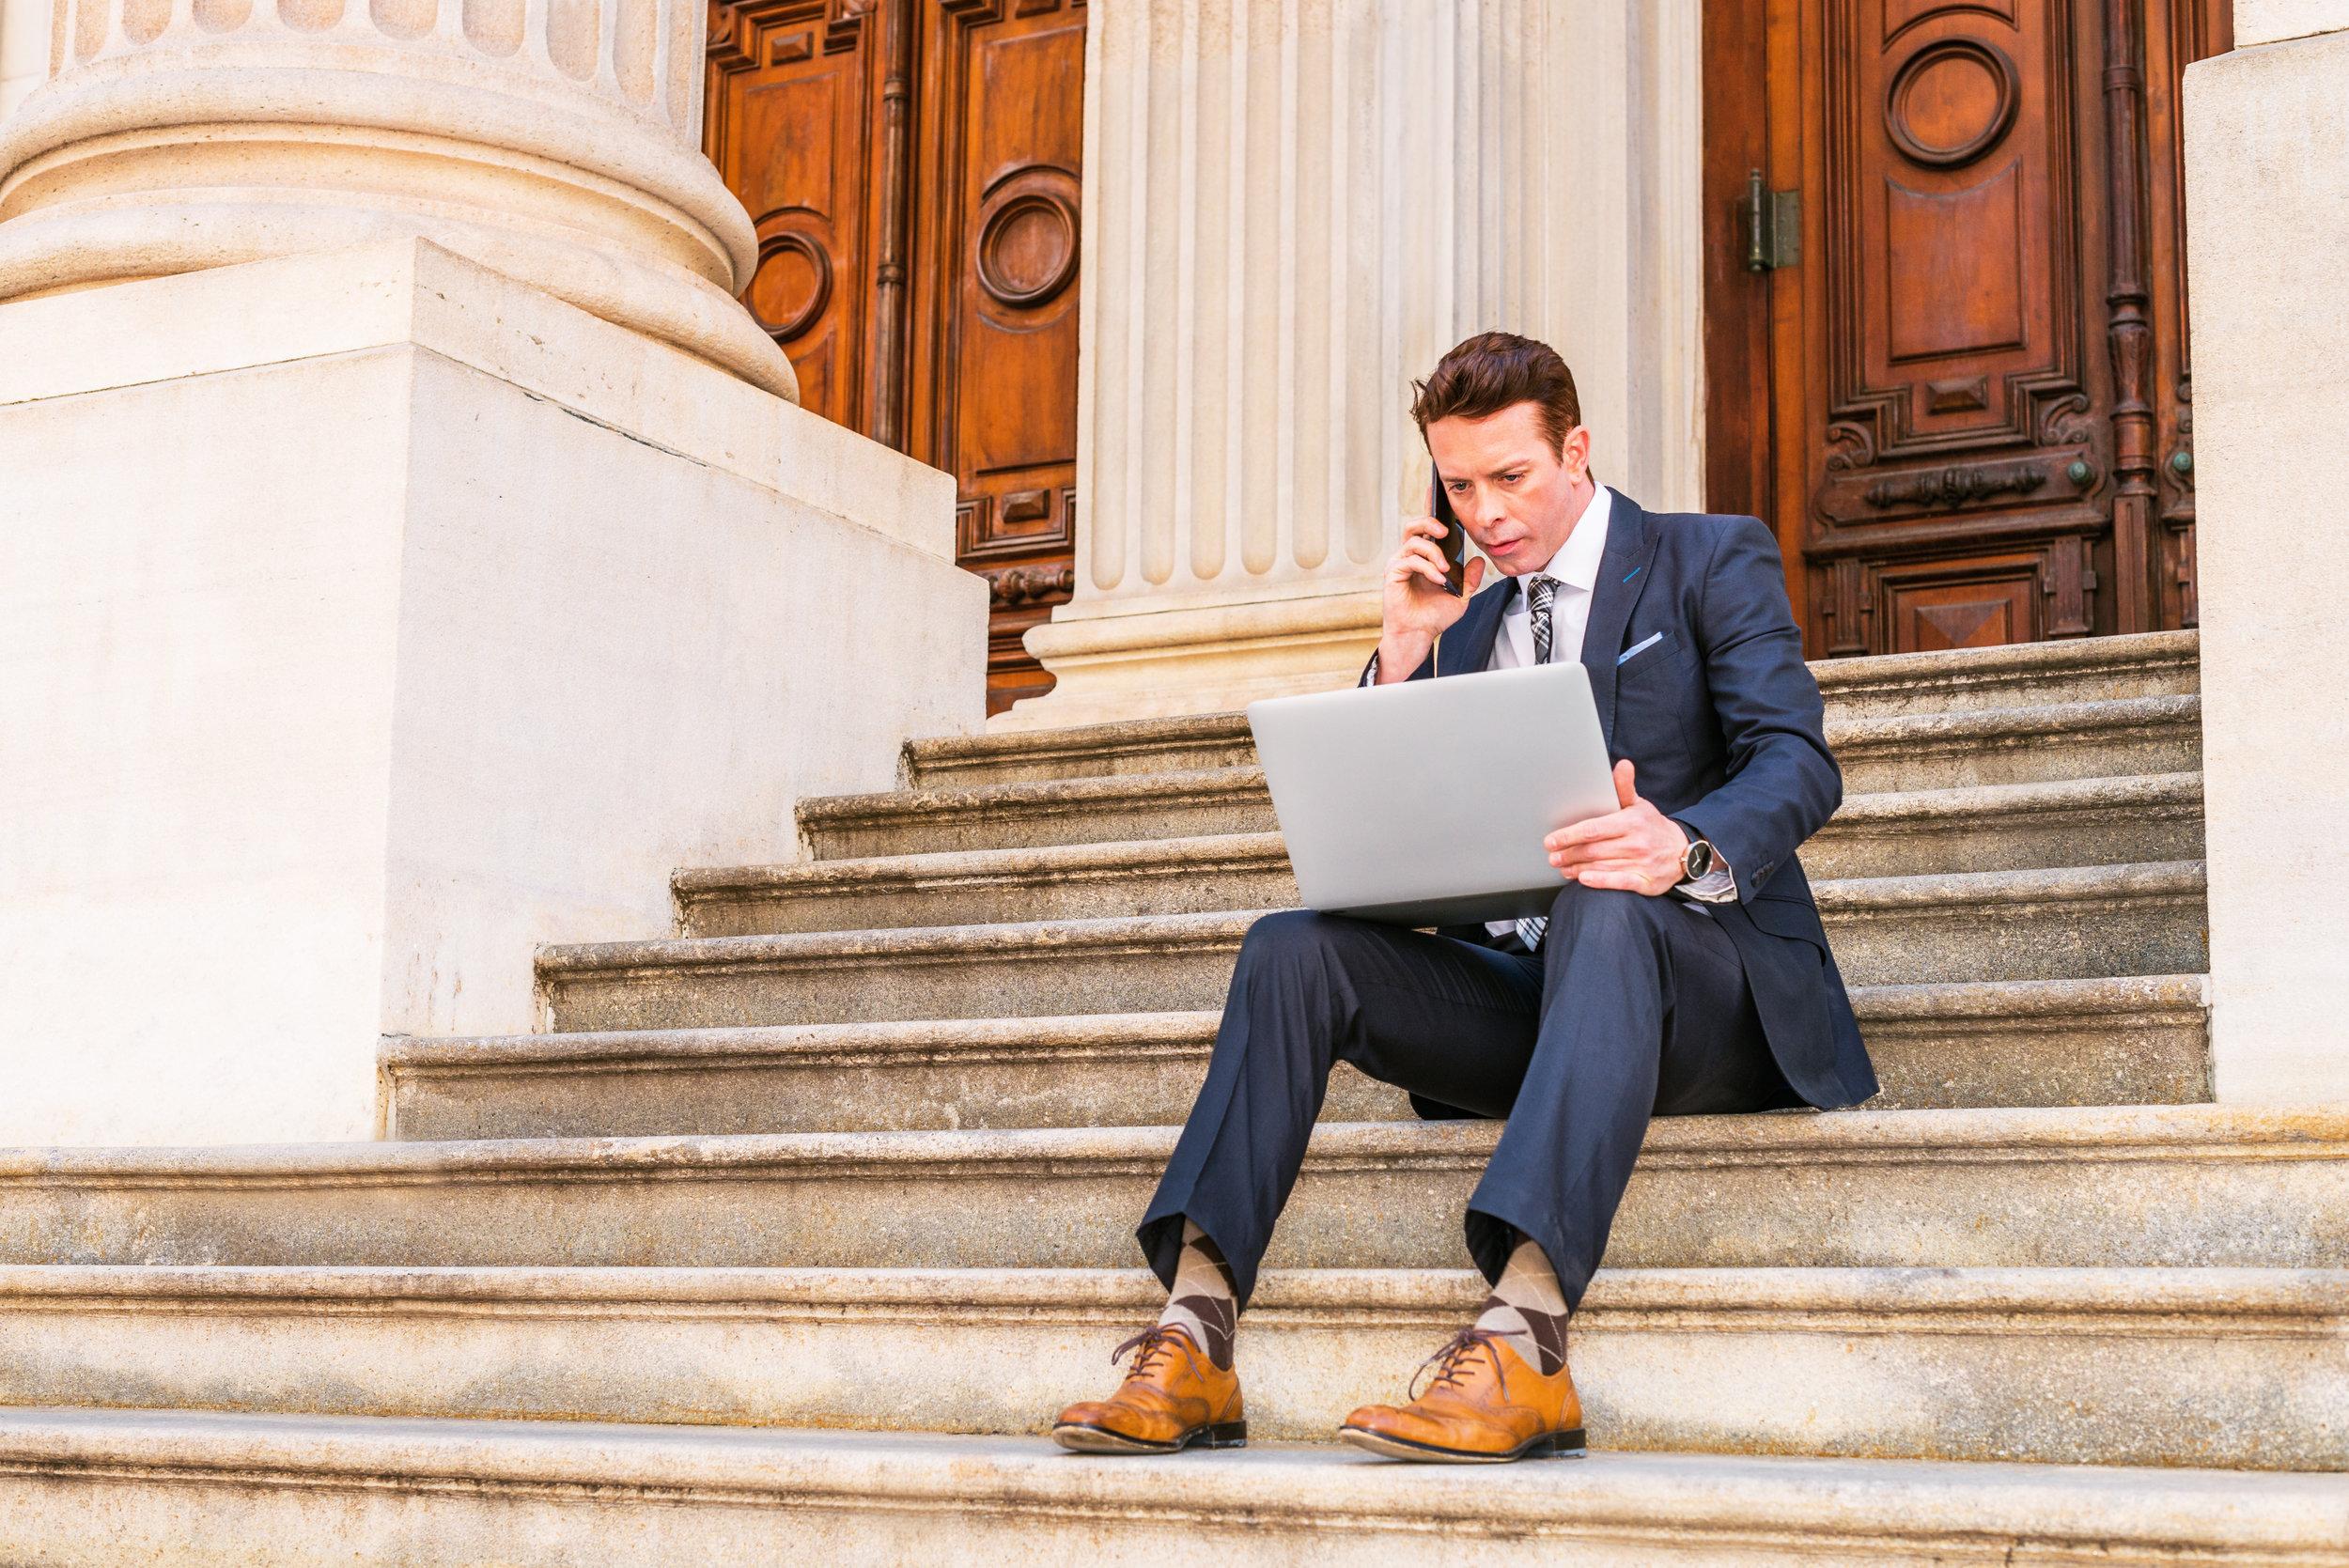 Law school admissions advising